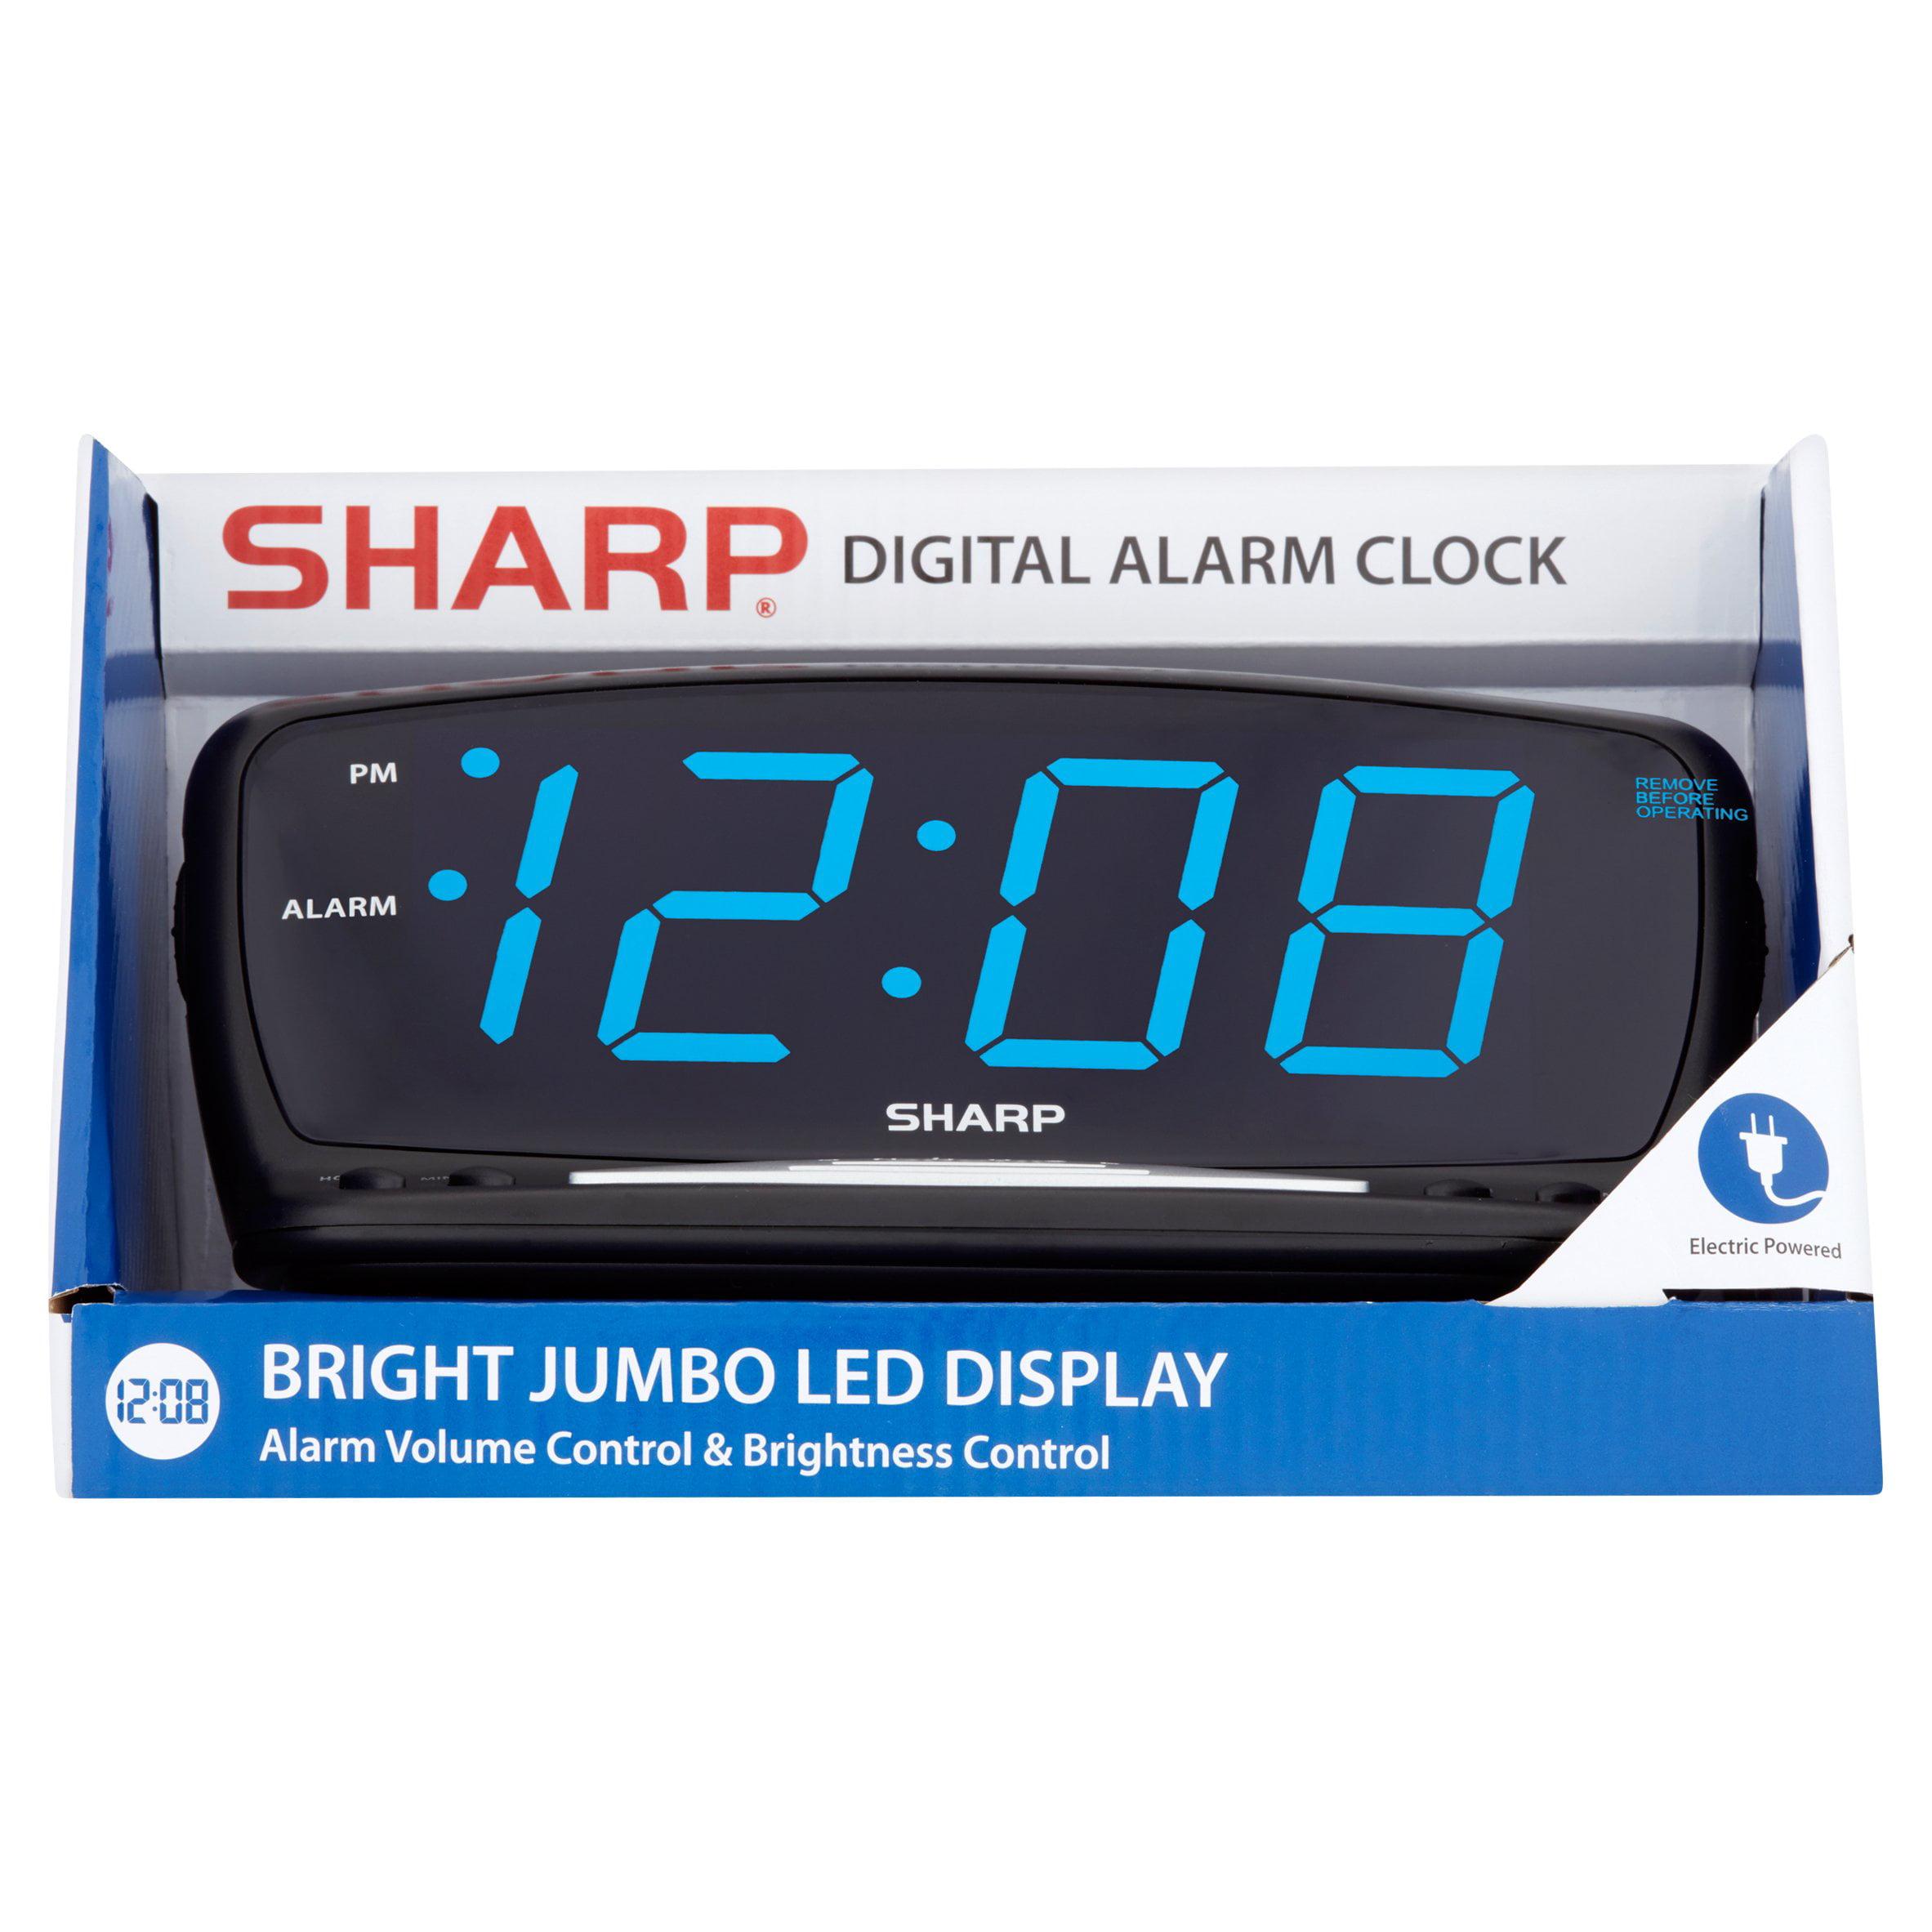 Sharp Bright Jumbo Led Display Digital Alarm Clock